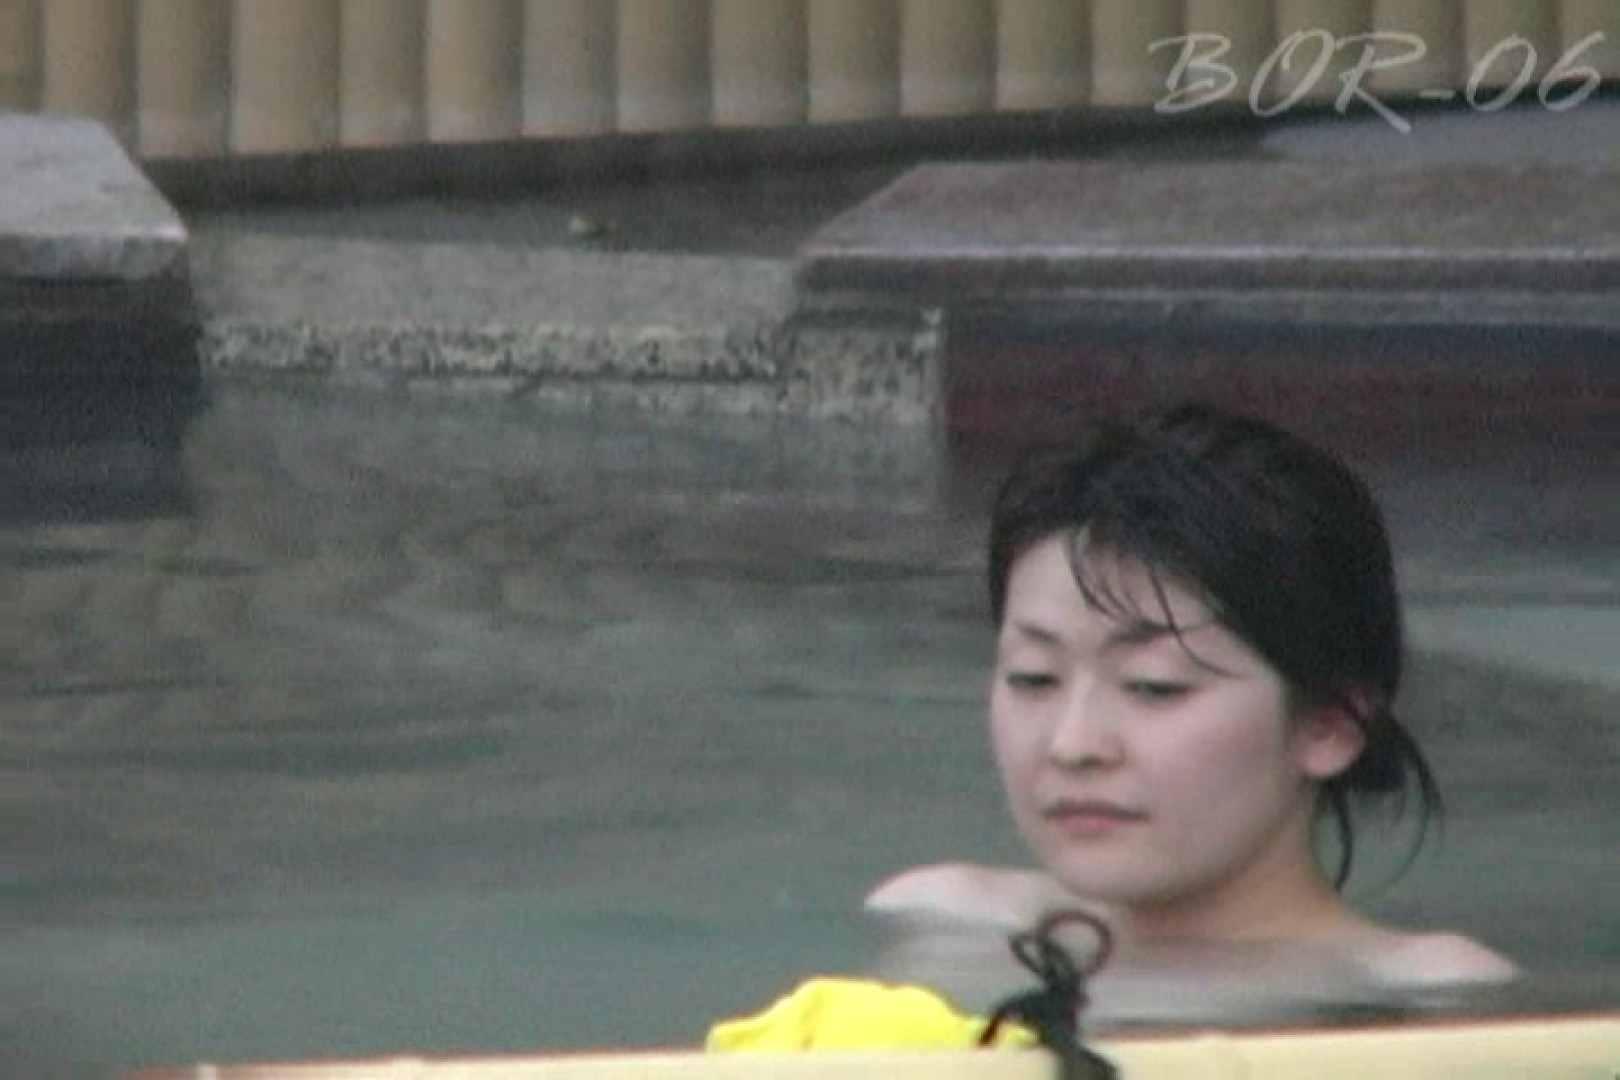 Aquaな露天風呂Vol.523 盗撮映像  93Pix 78